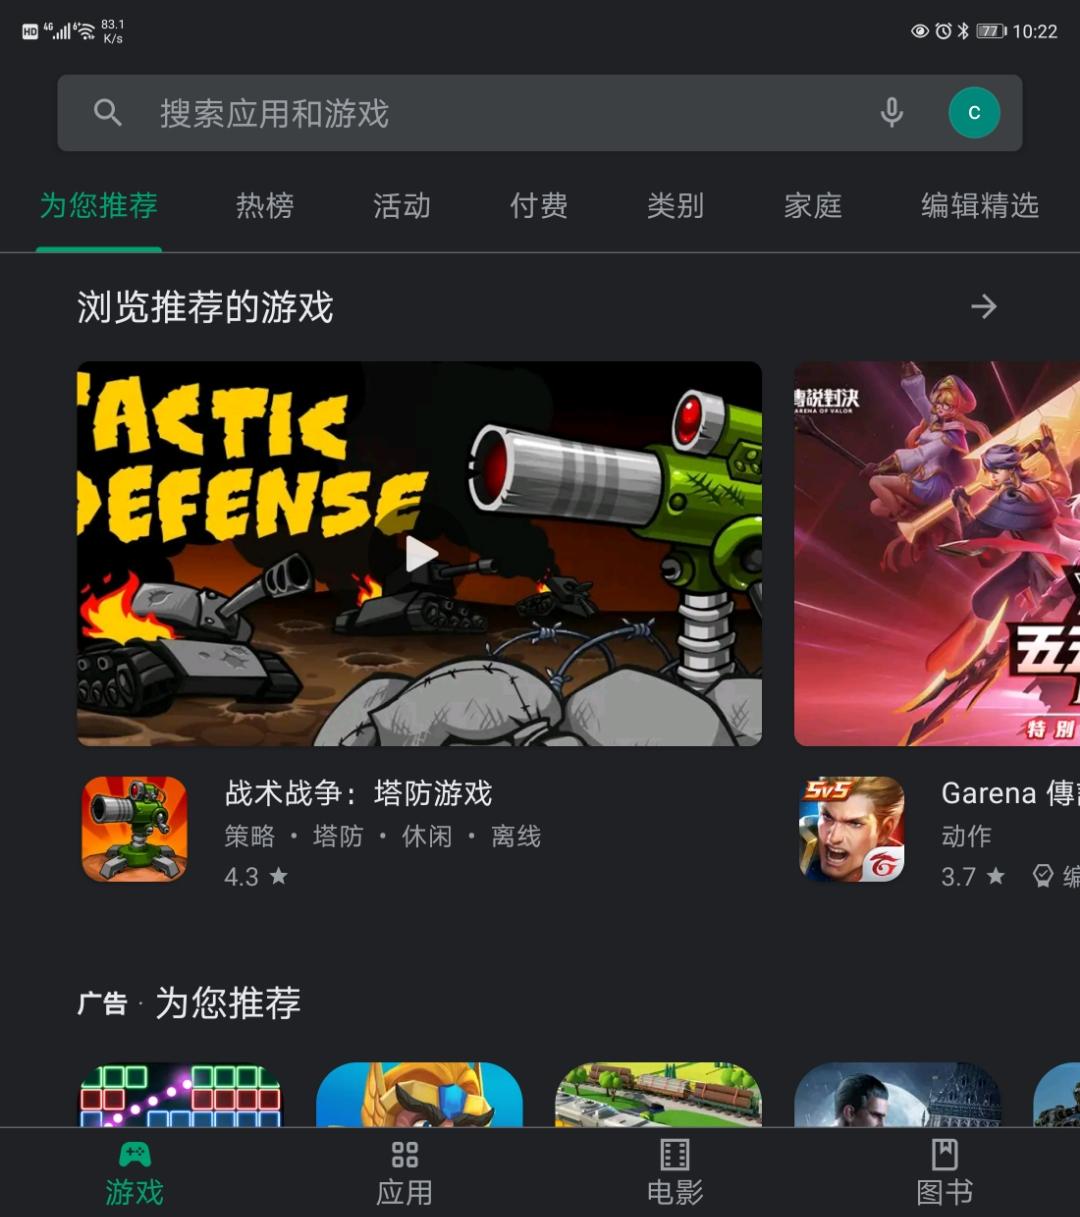 Screenshot_20210505_102236_com.android.vending.jpg